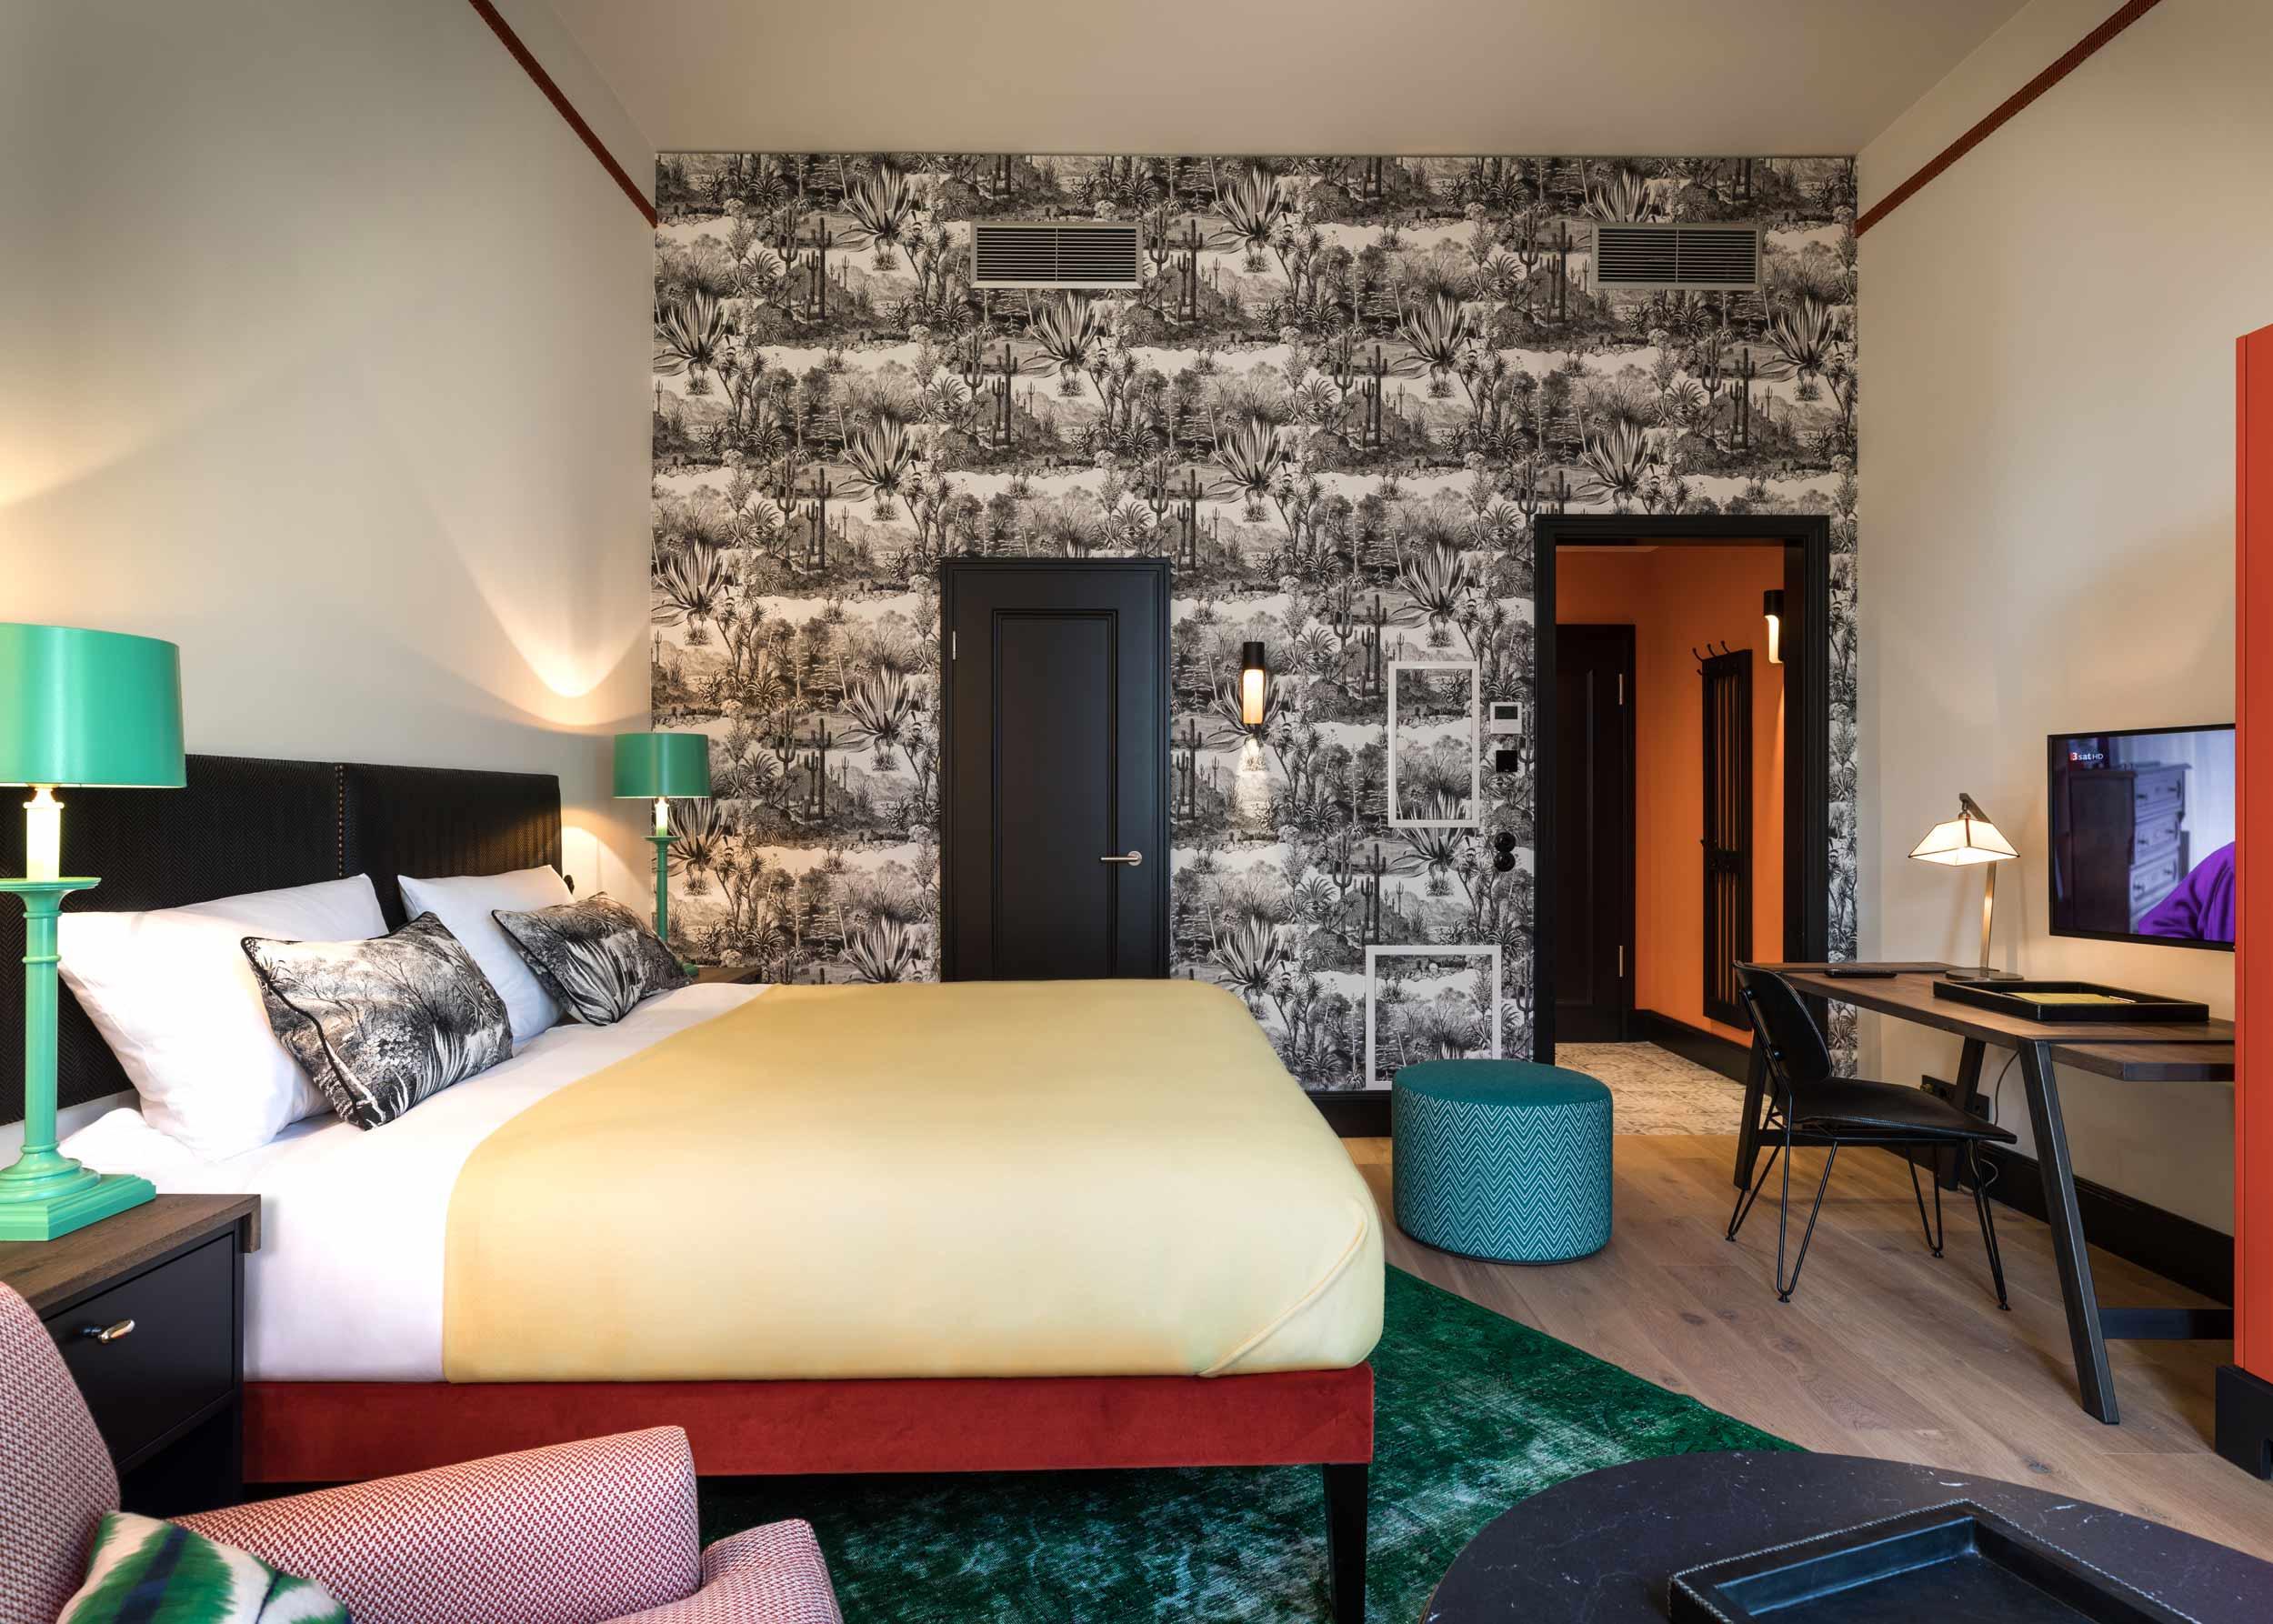 hamburg studio apartments apartment decorating ideas. Black Bedroom Furniture Sets. Home Design Ideas